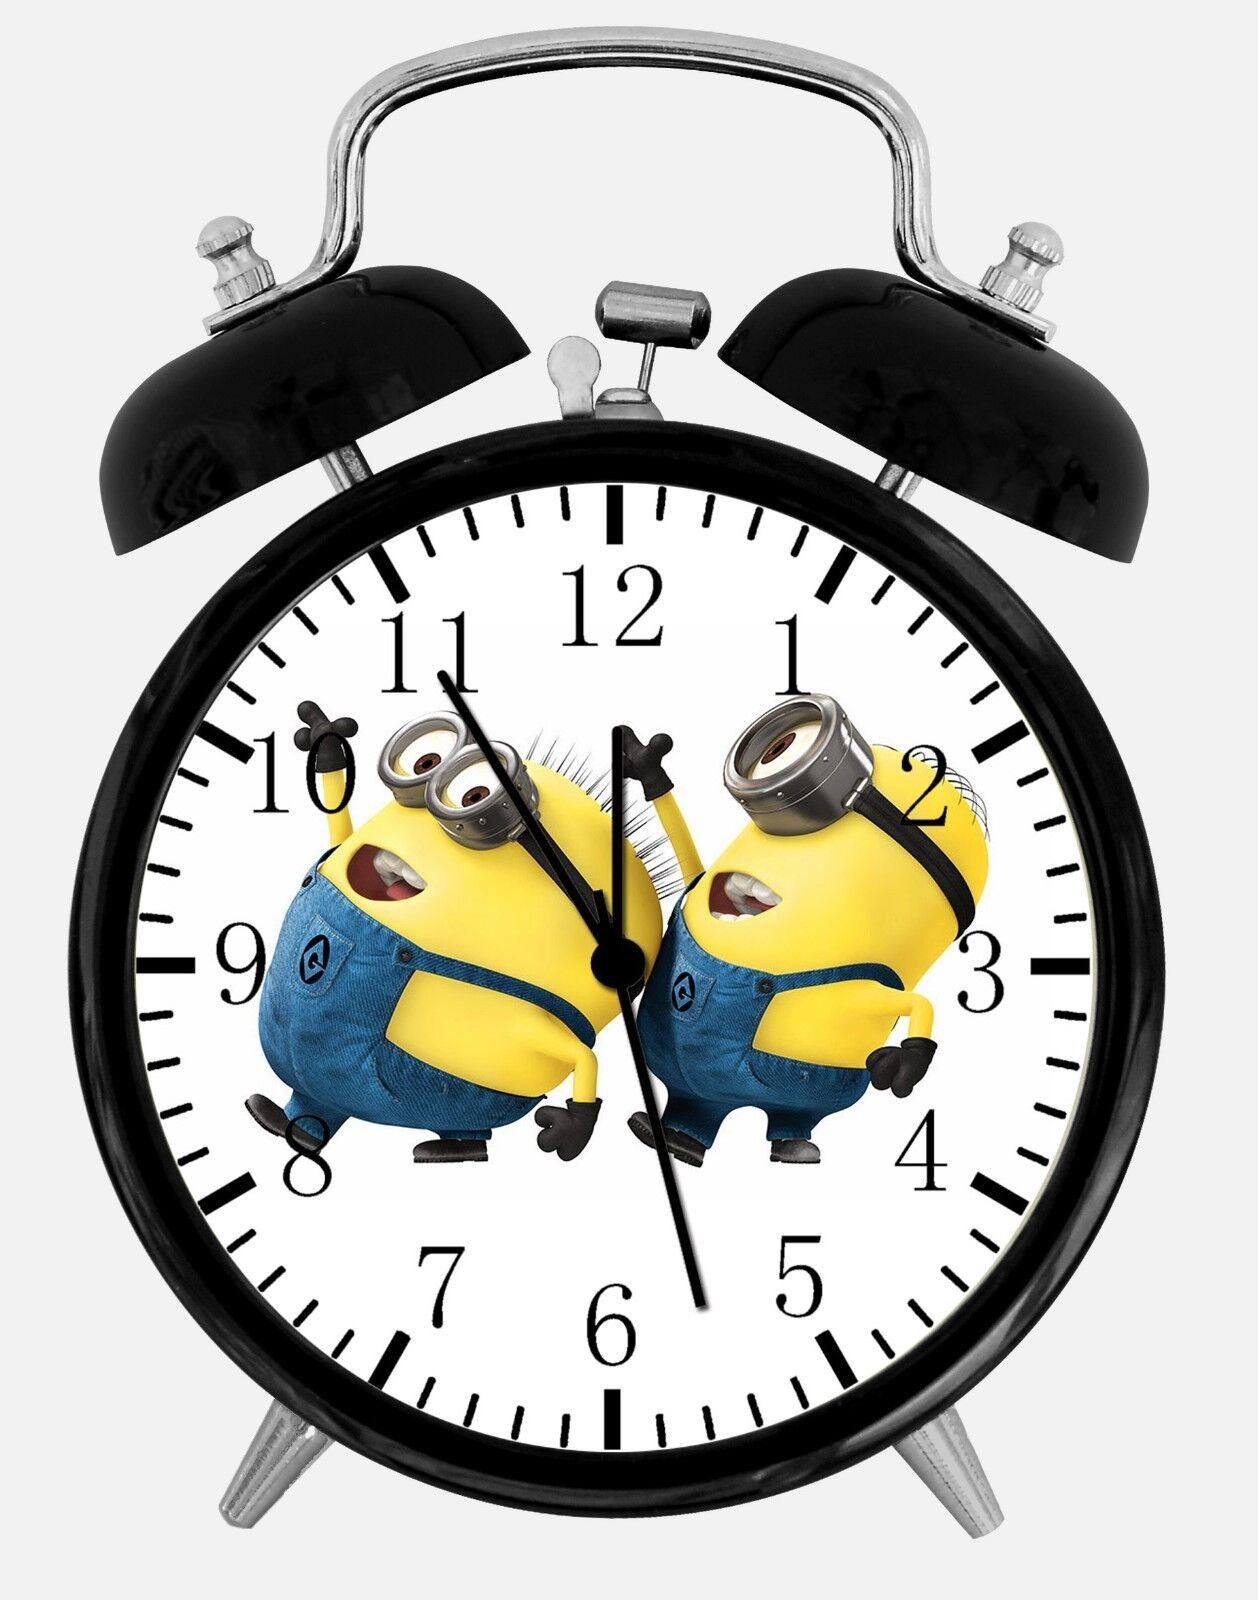 "Cute Funny Minions Alarm Desk Clock 3.75"" Room Office Decor E49 Be A Nice Gift"